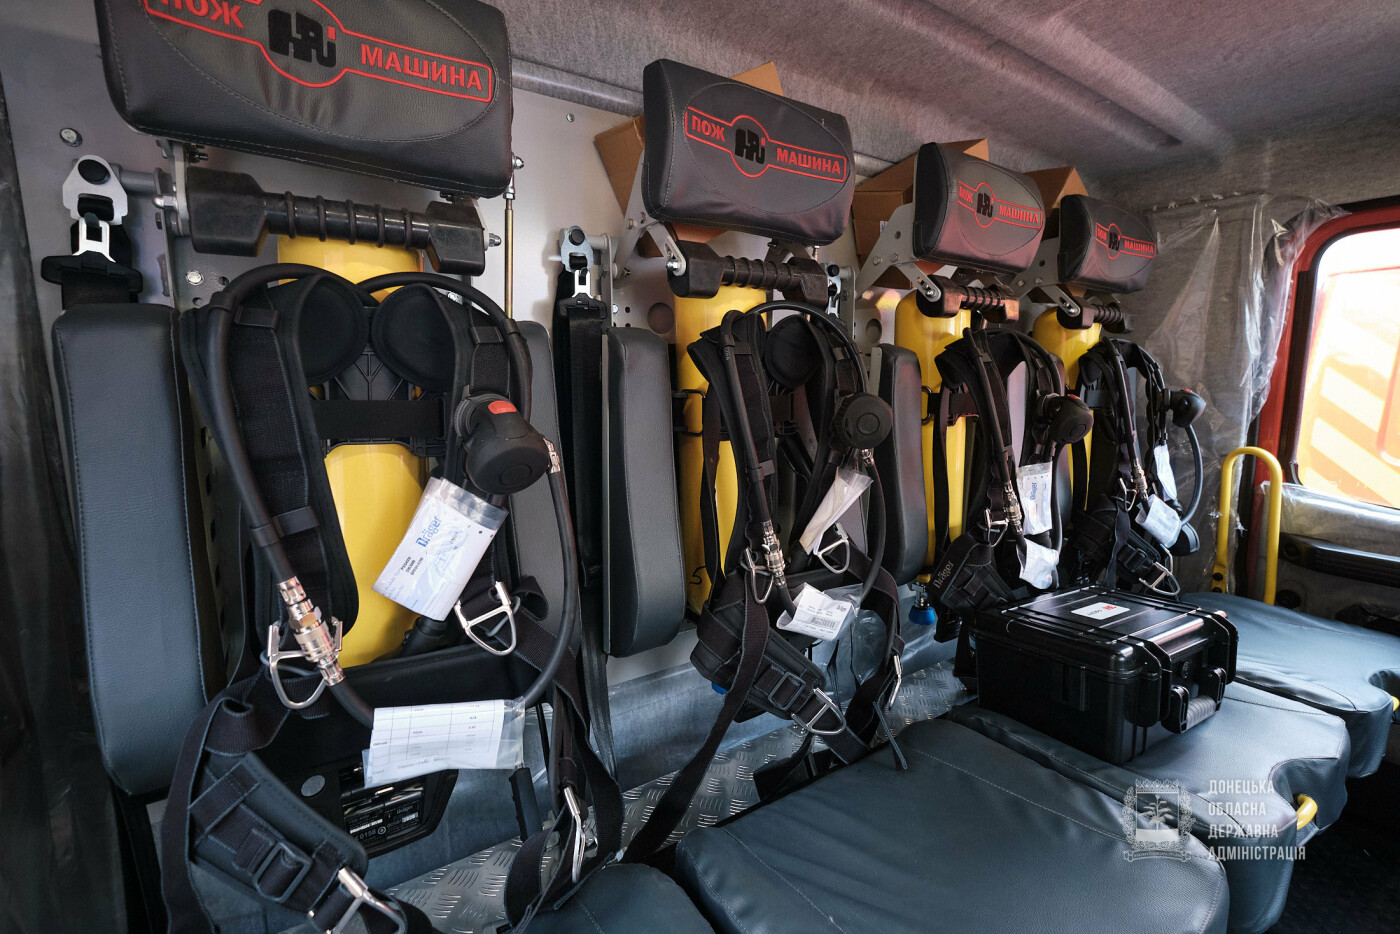 Слов'янські рятувальники отримали нову пожежну автоцистерну, фото-21